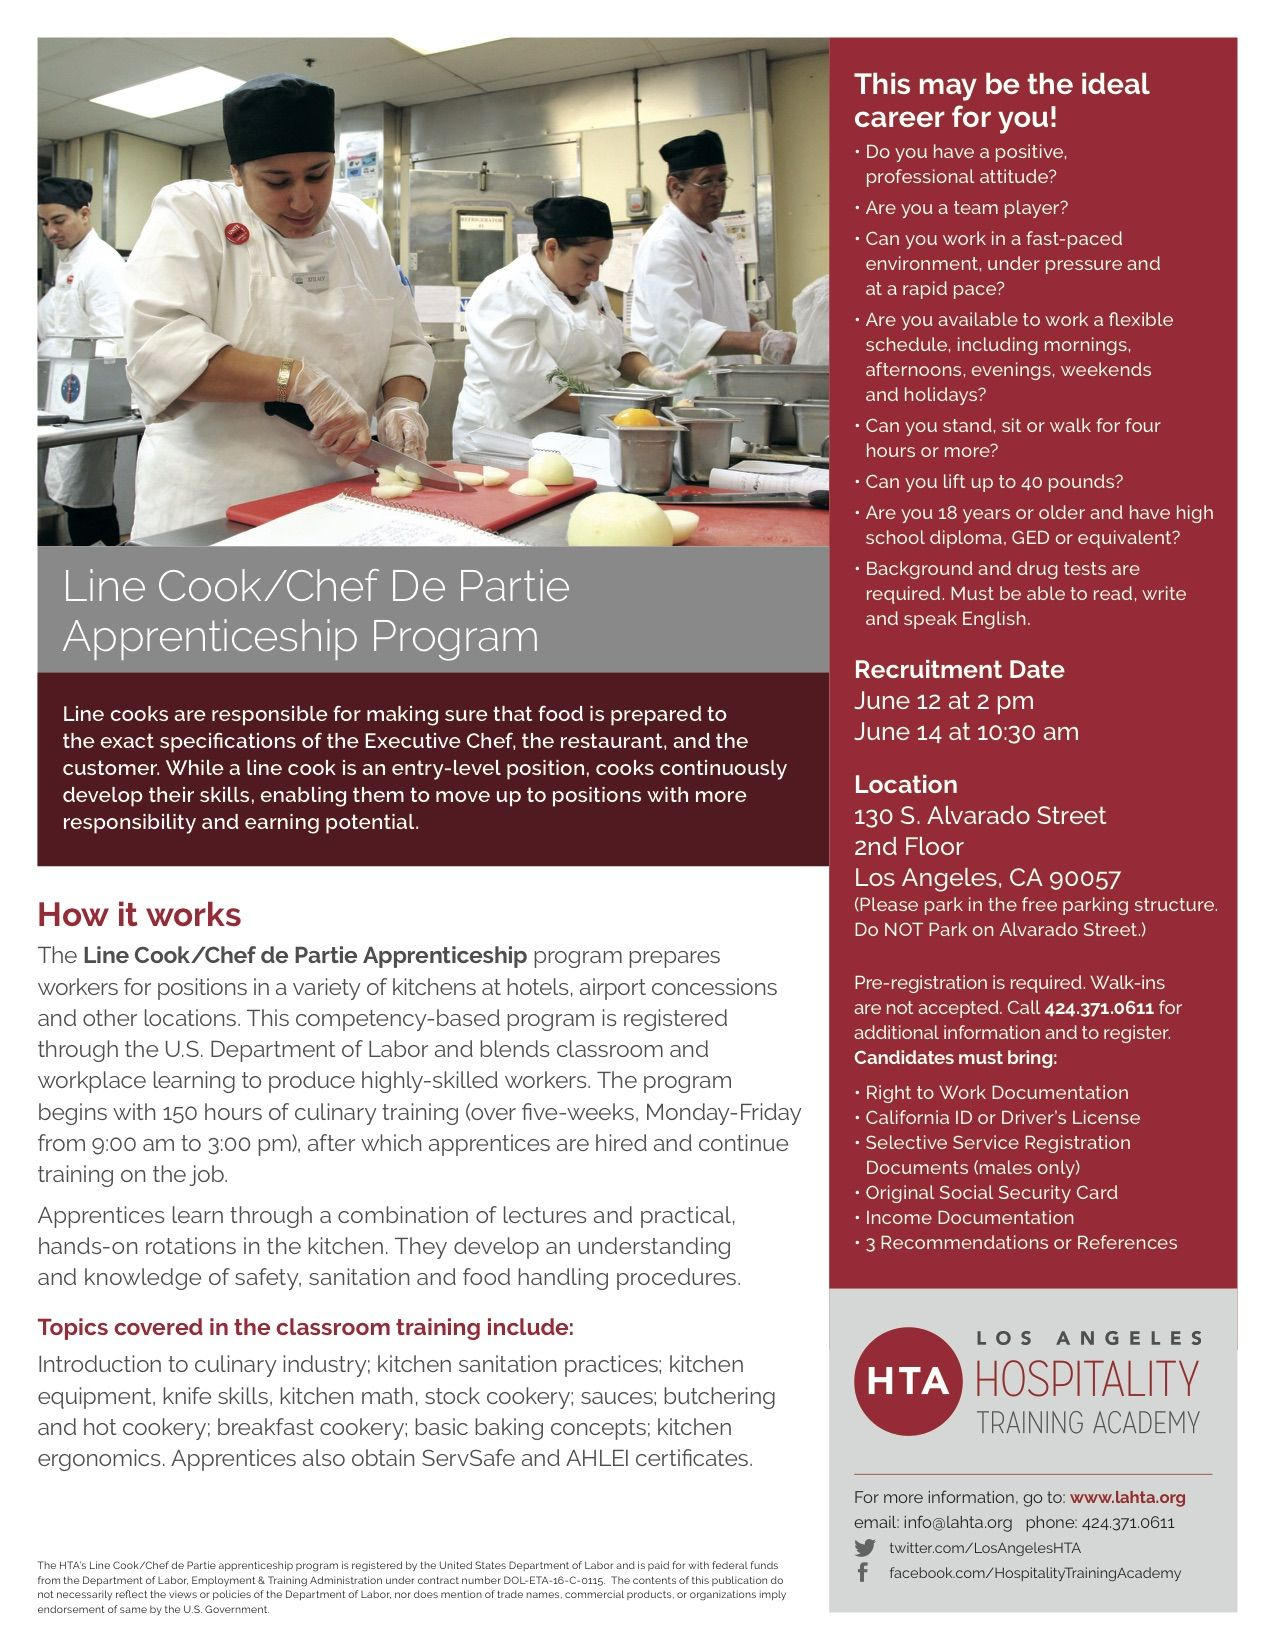 Elegant Line Cook/Chef De Partie Apprenticeship Program   Hospitality Training Academy  Los AngelesHospitality Training Academy Los Angeles